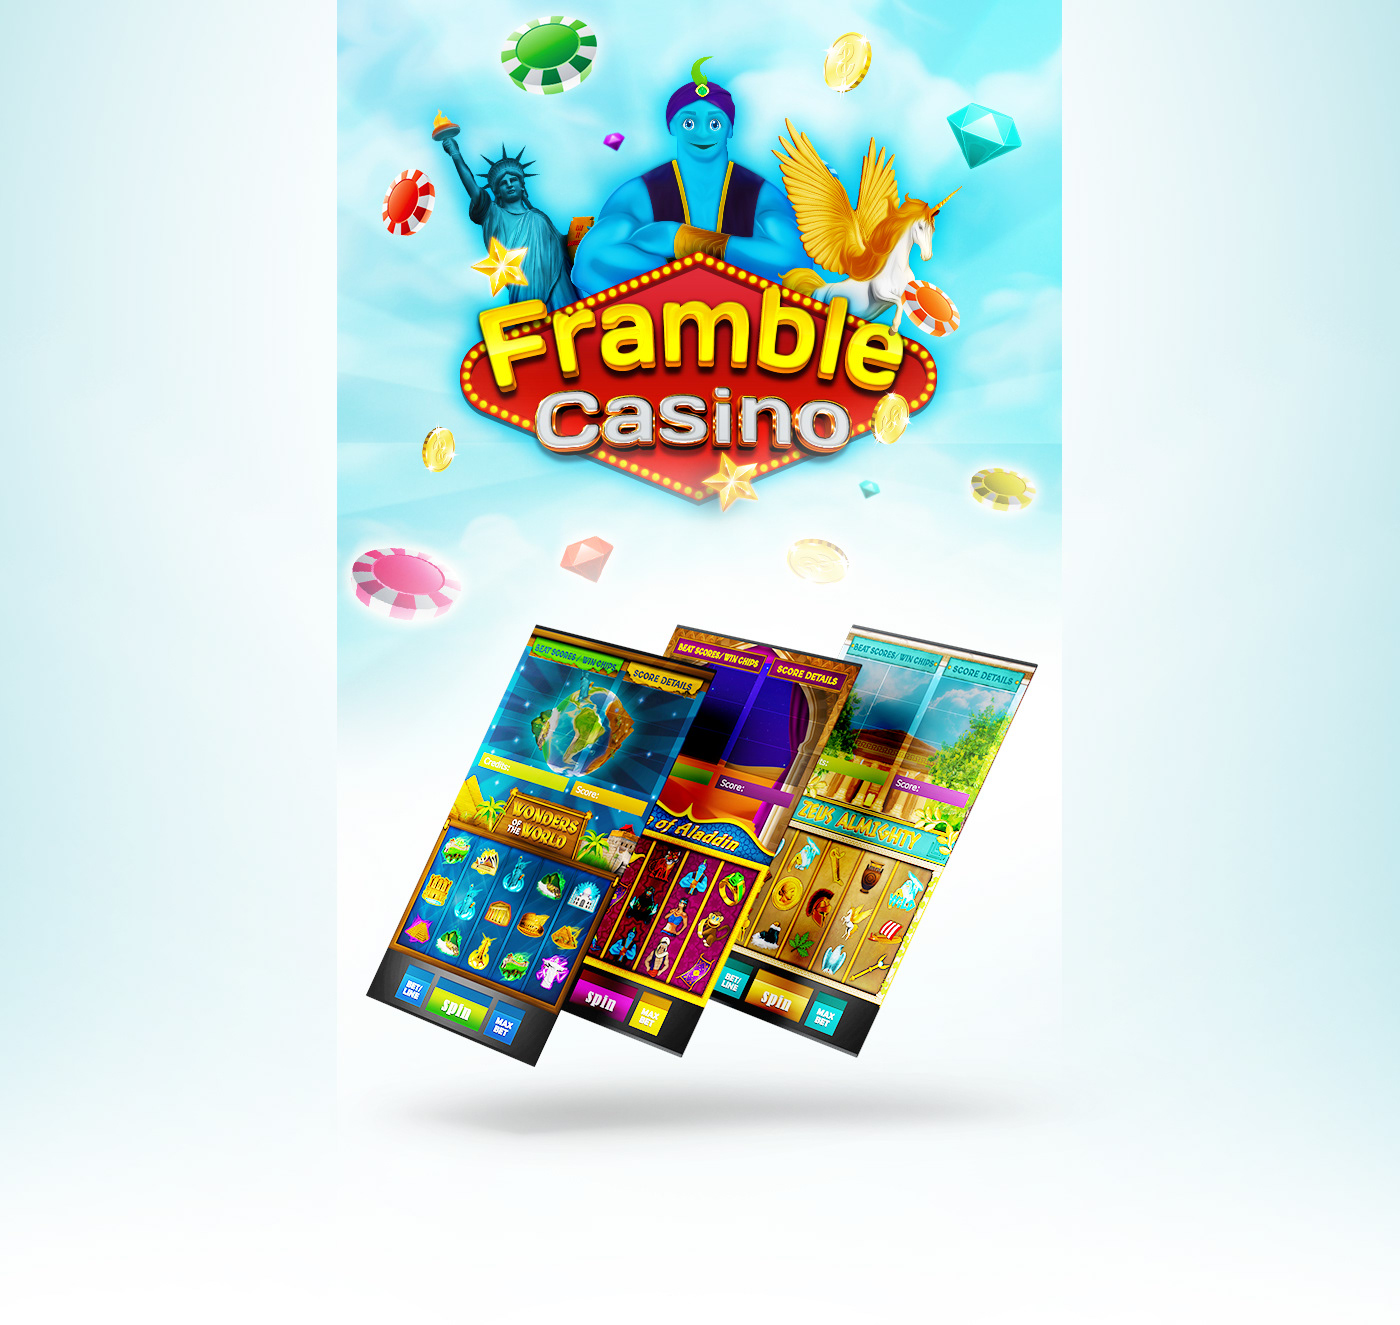 Mobile Slot Machine Games